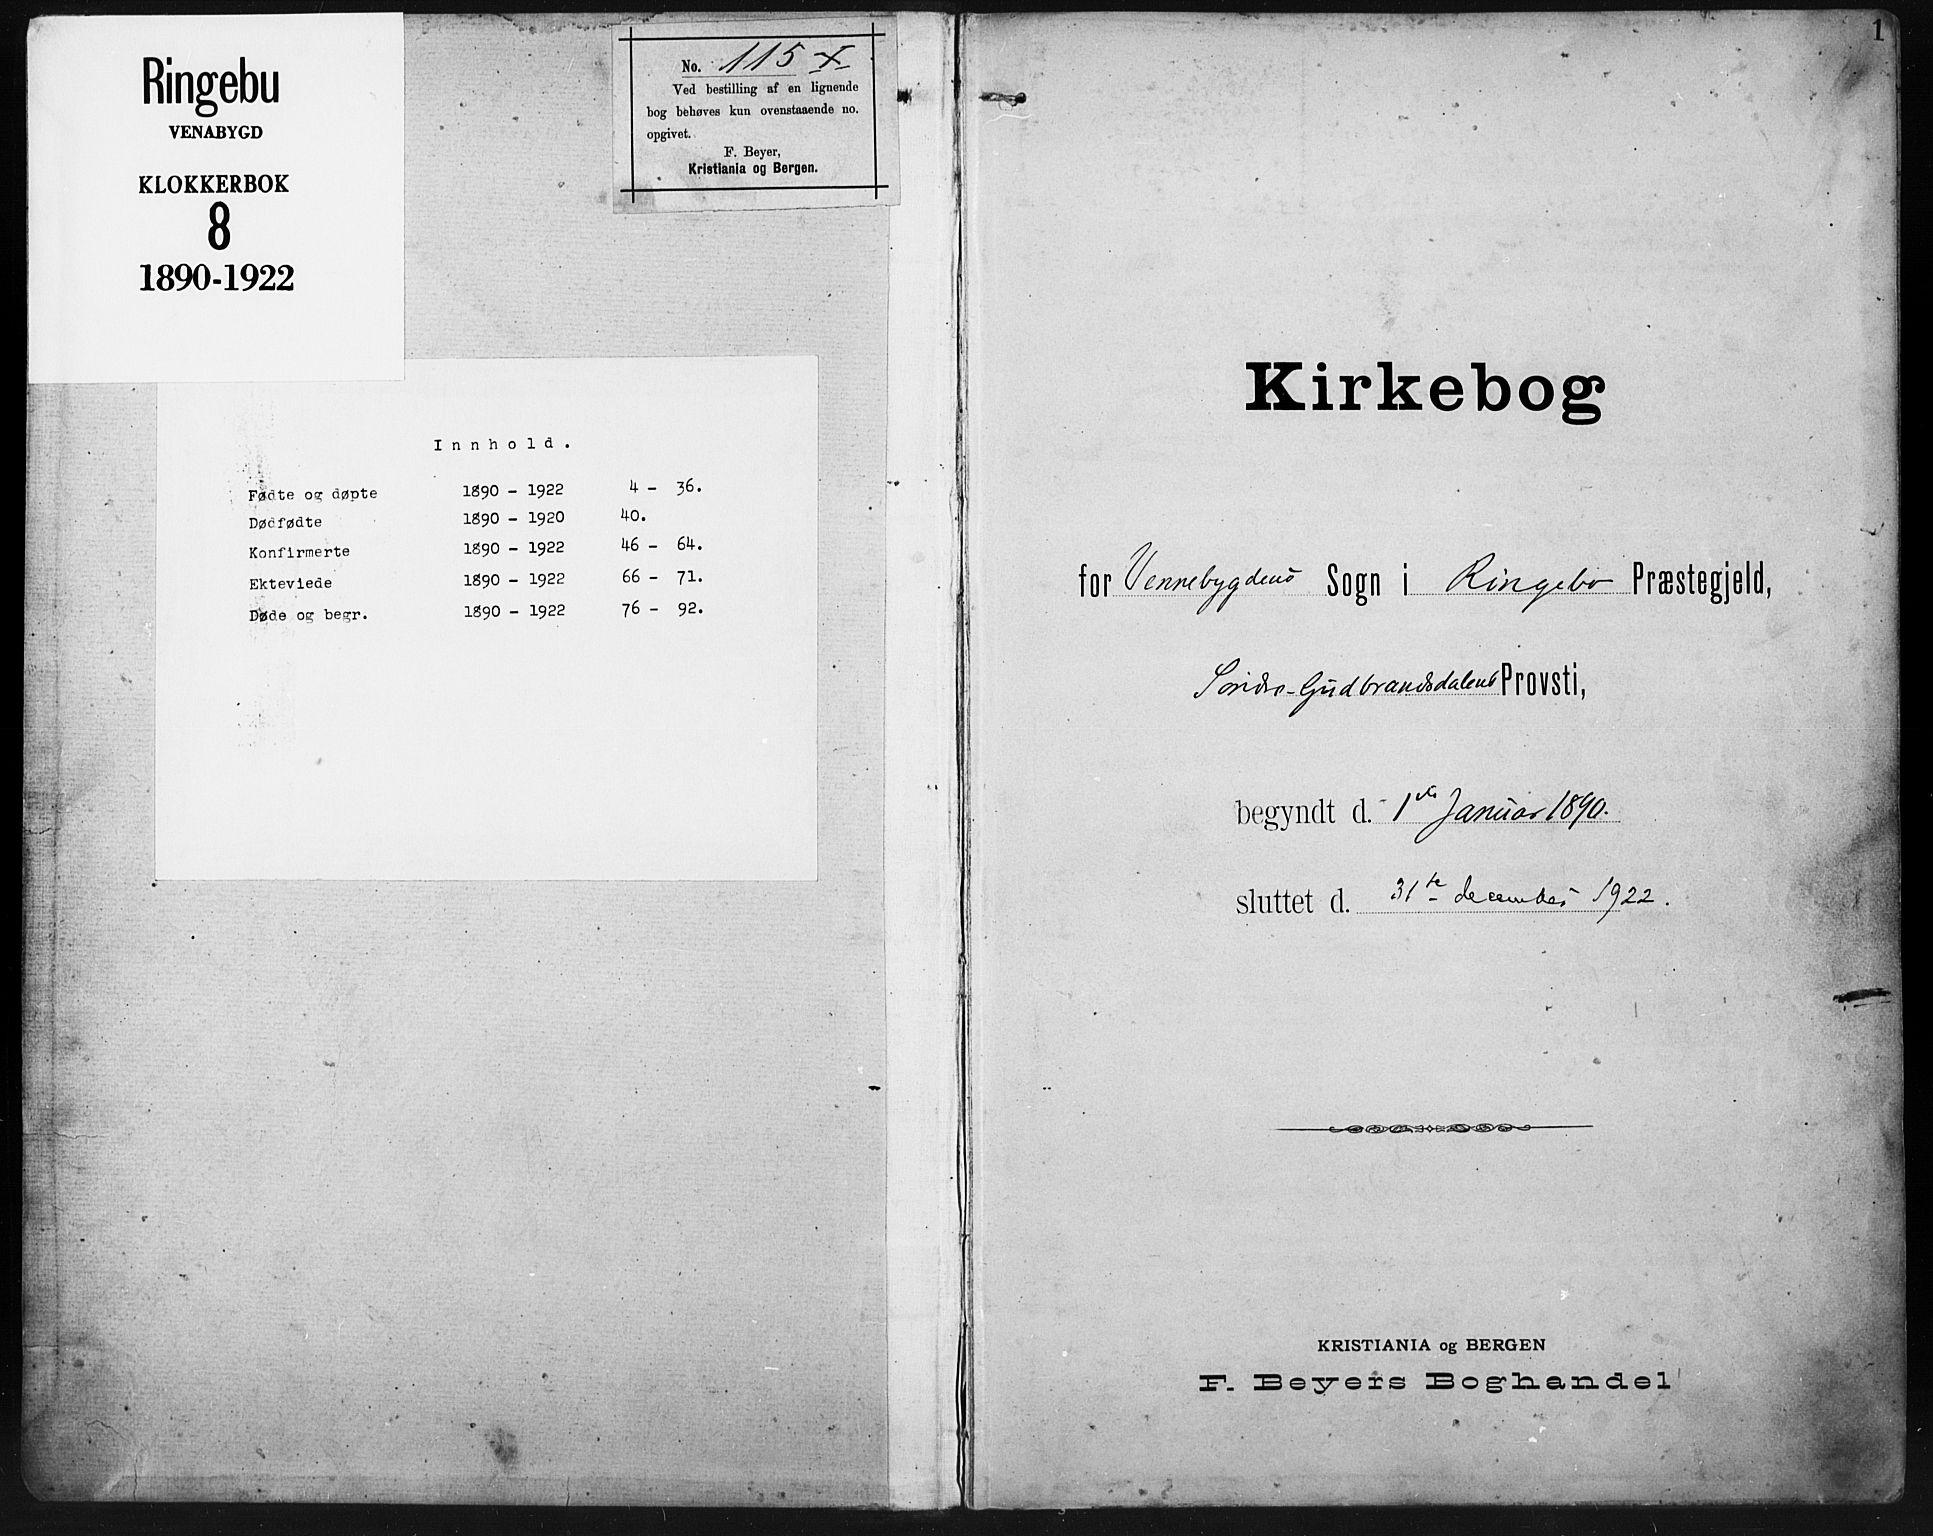 SAH, Ringebu prestekontor, Klokkerbok nr. 8, 1890-1922, s. 1